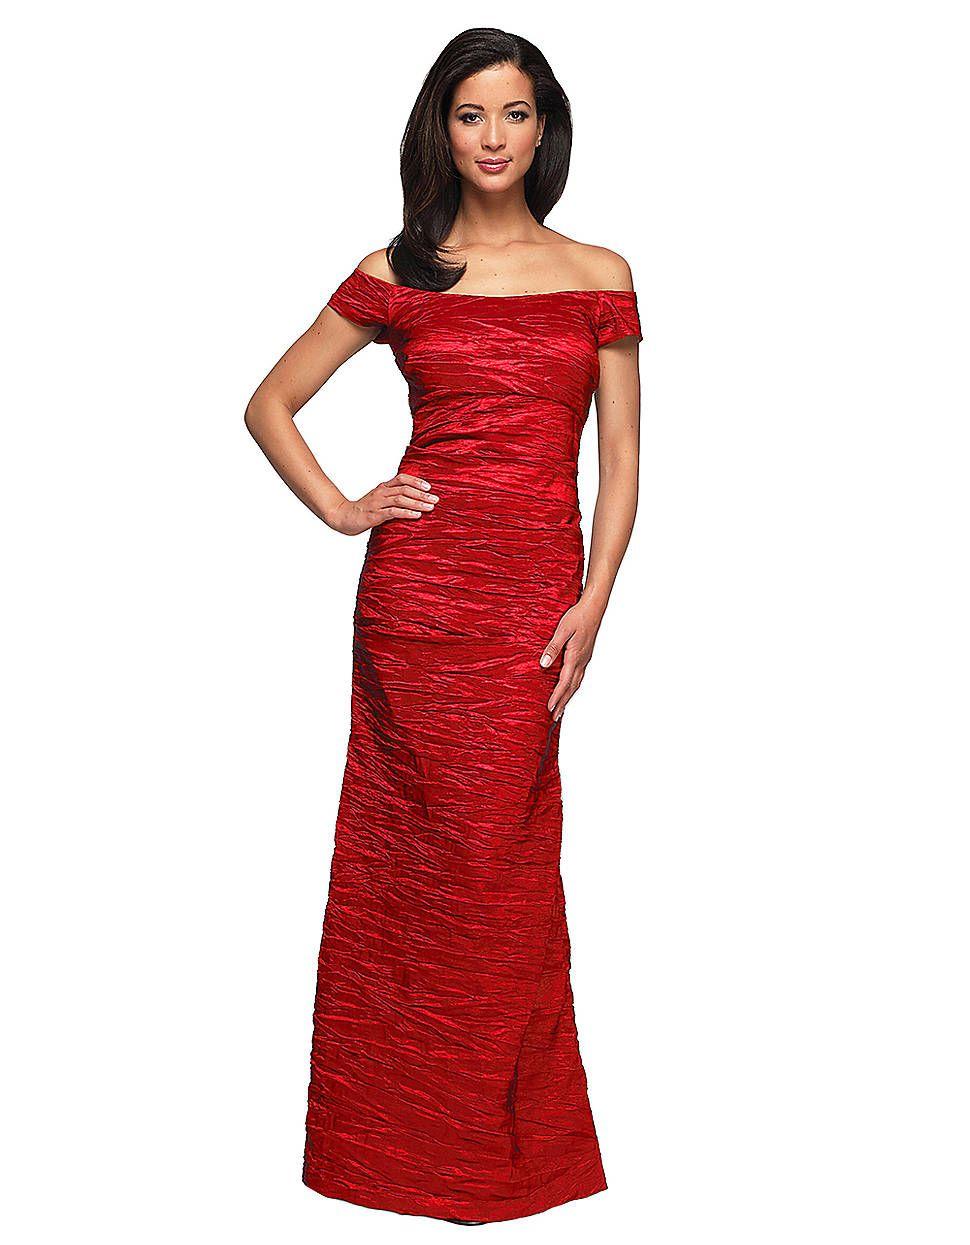 Women\'s Red Long Off The Shoulder Stretch Taffeta Dress   Fashion ...